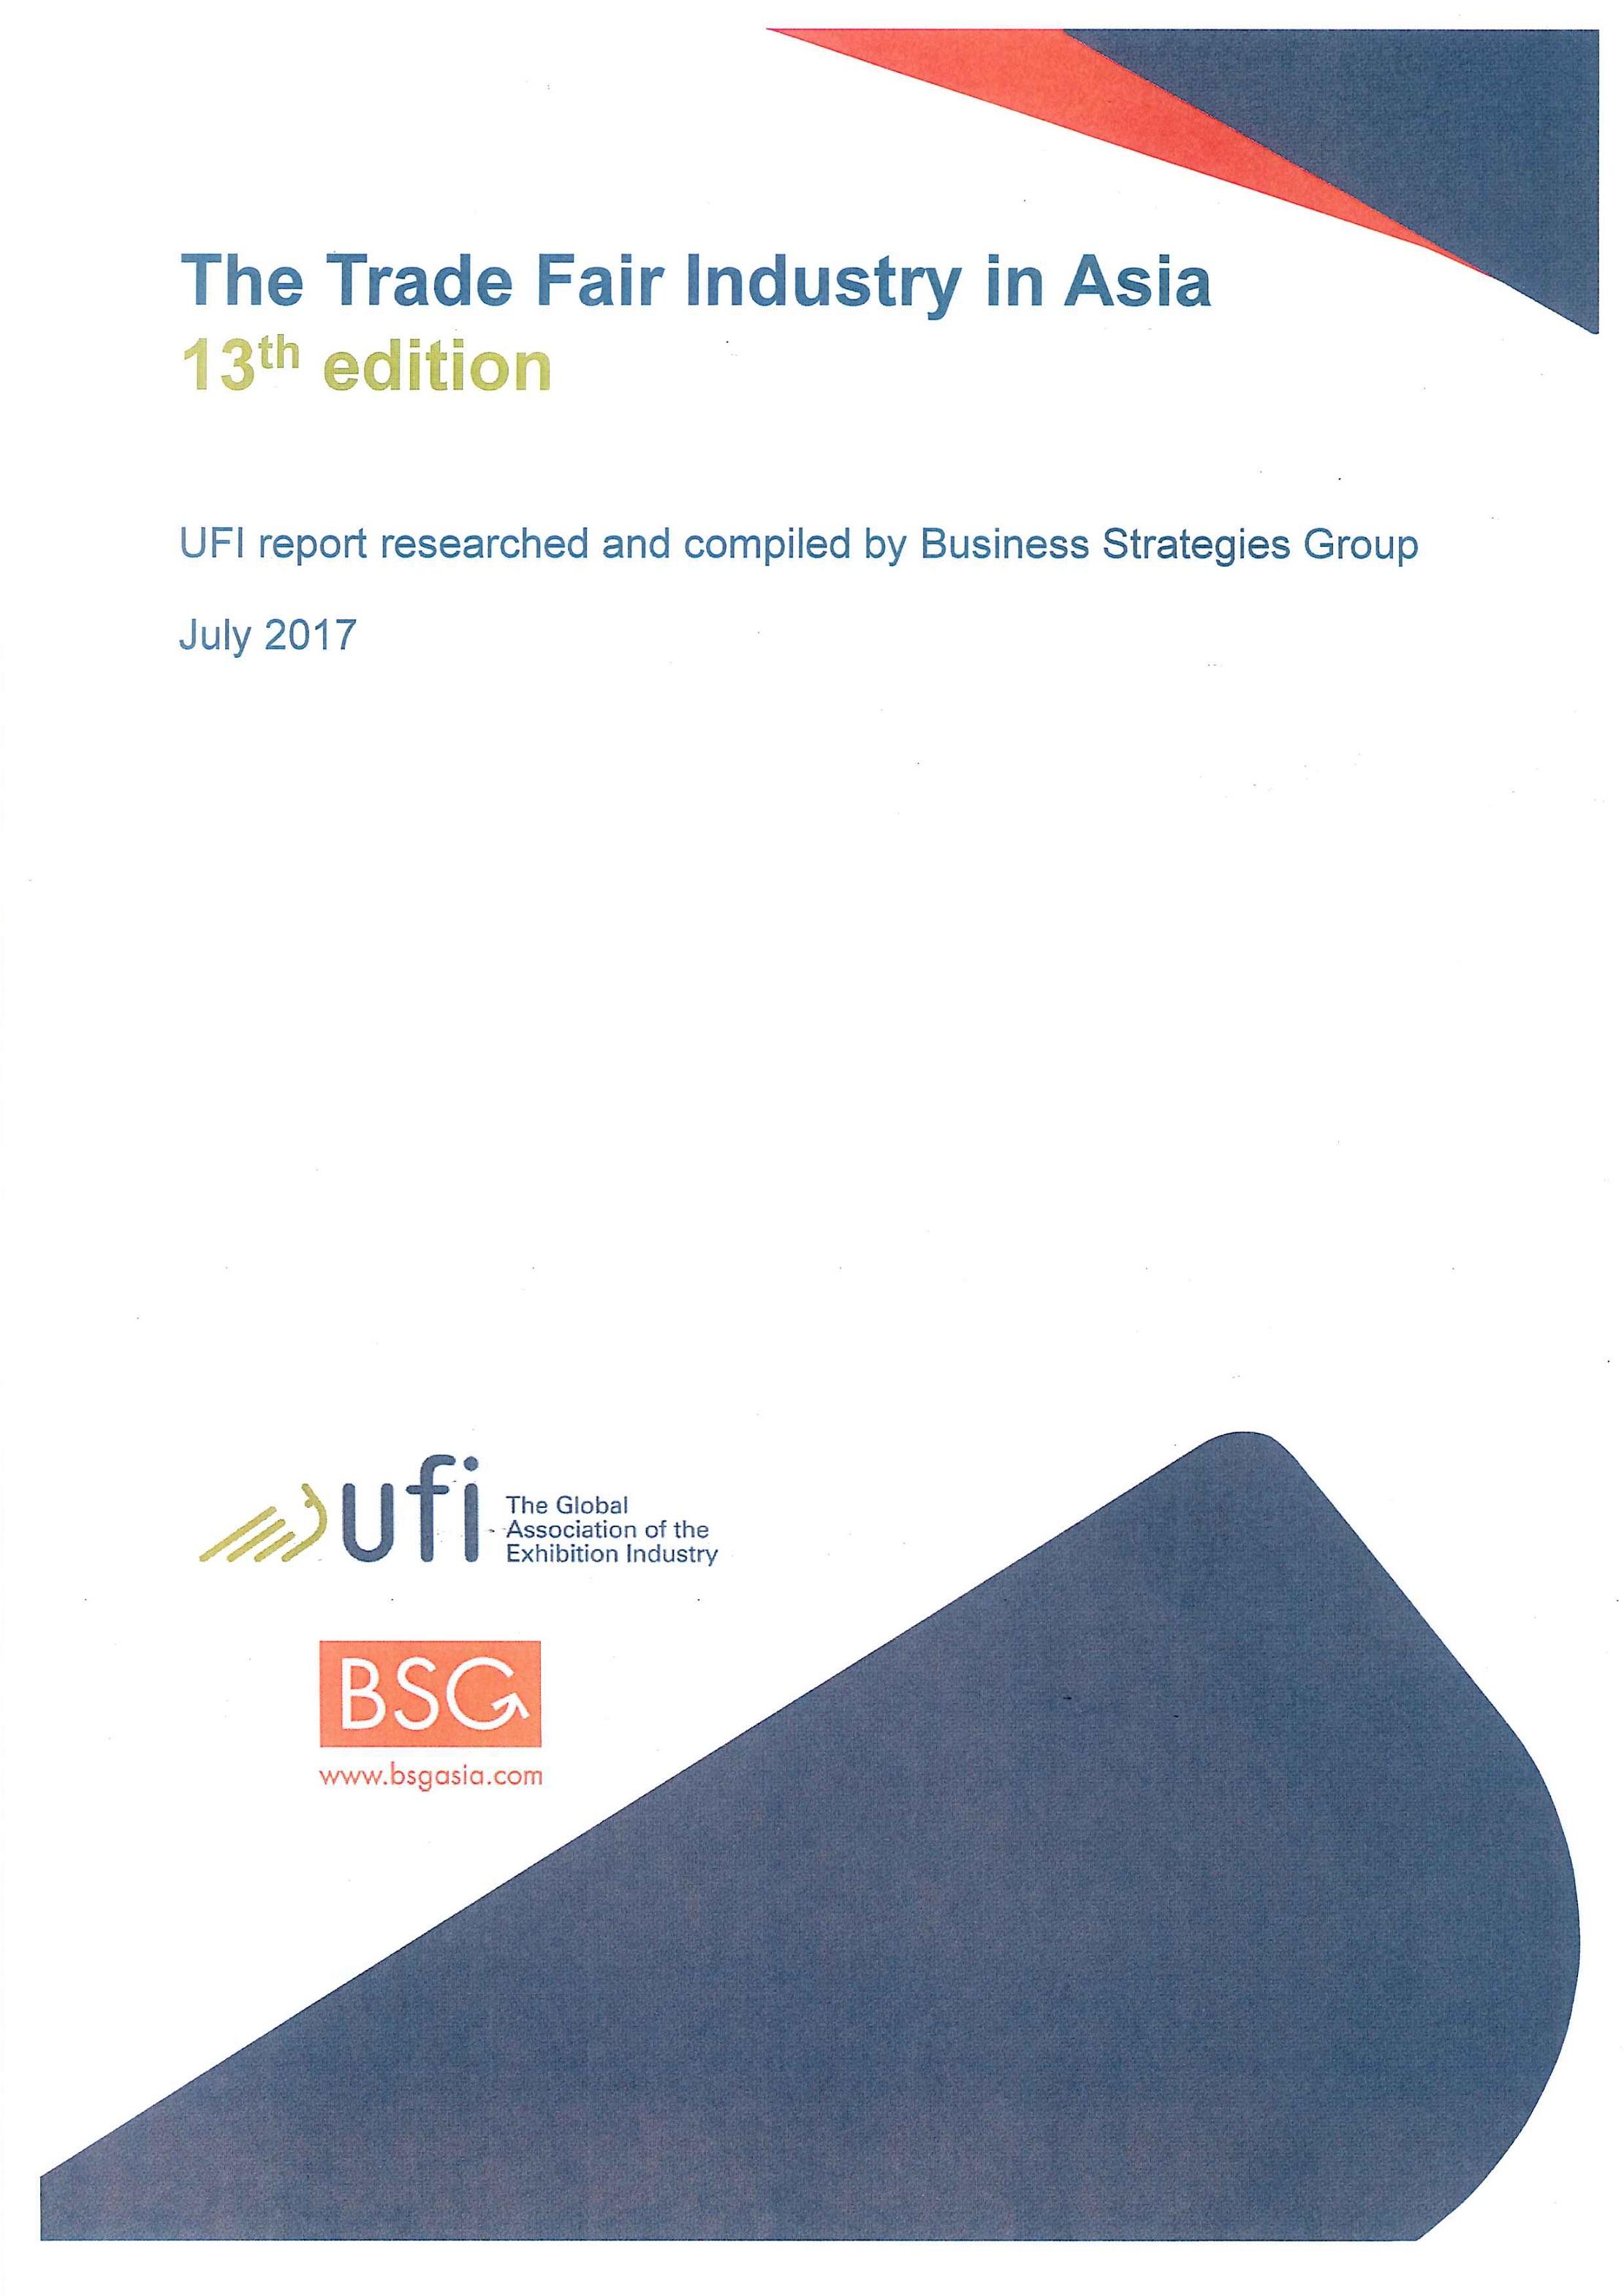 The trade fair industry in Asia [e-book]